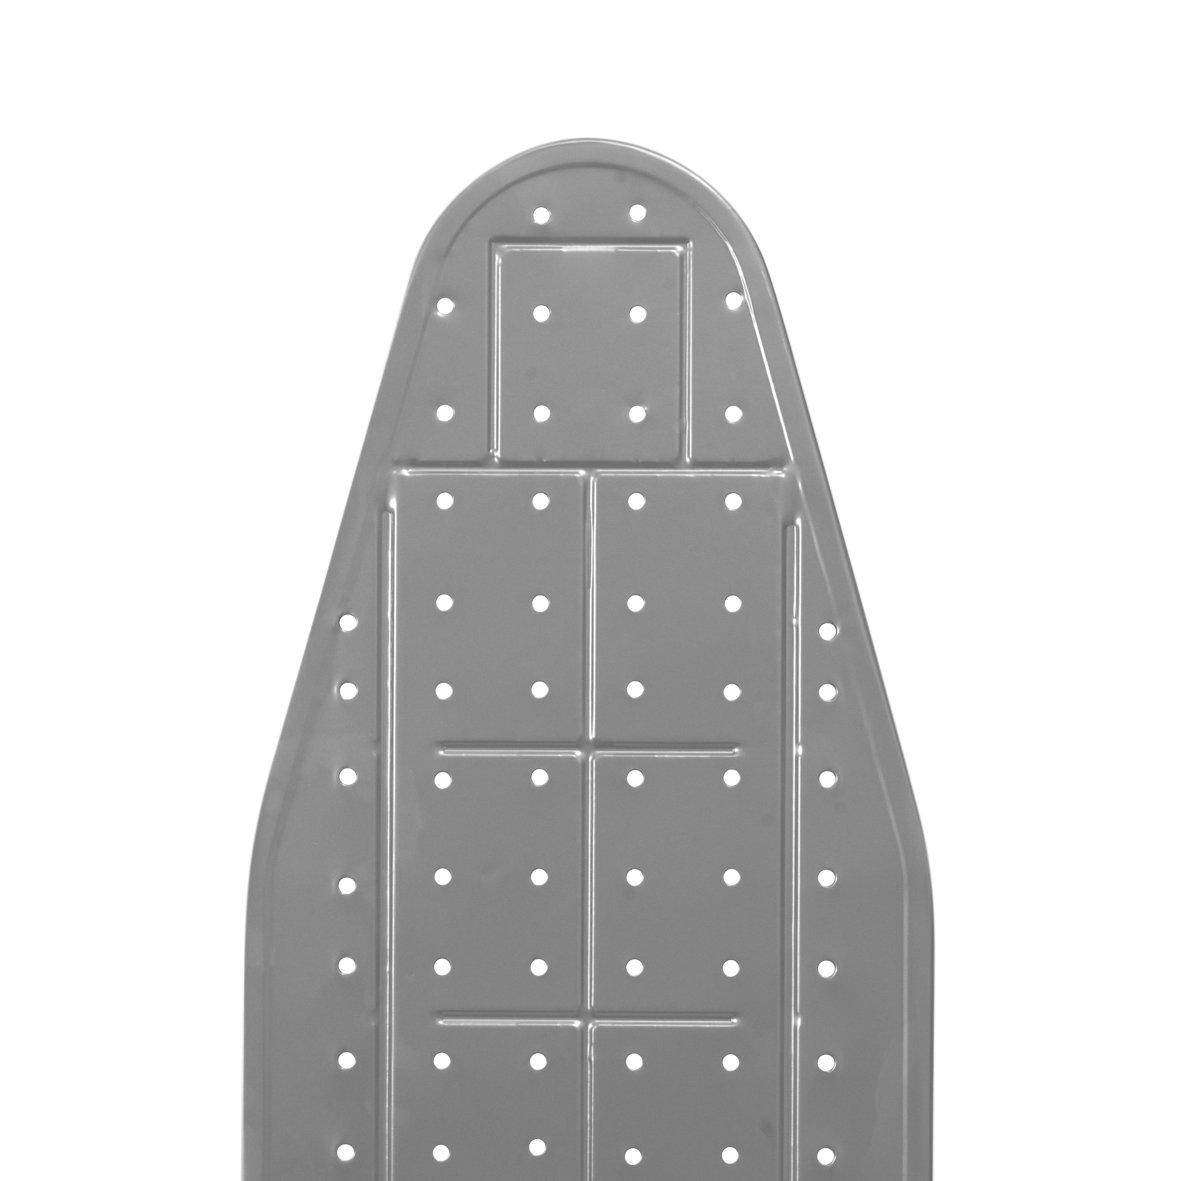 Econat Viva Adjustable Foot Caps, 4-Leg, Adjustable Height, Large Ironing Board (Grey)